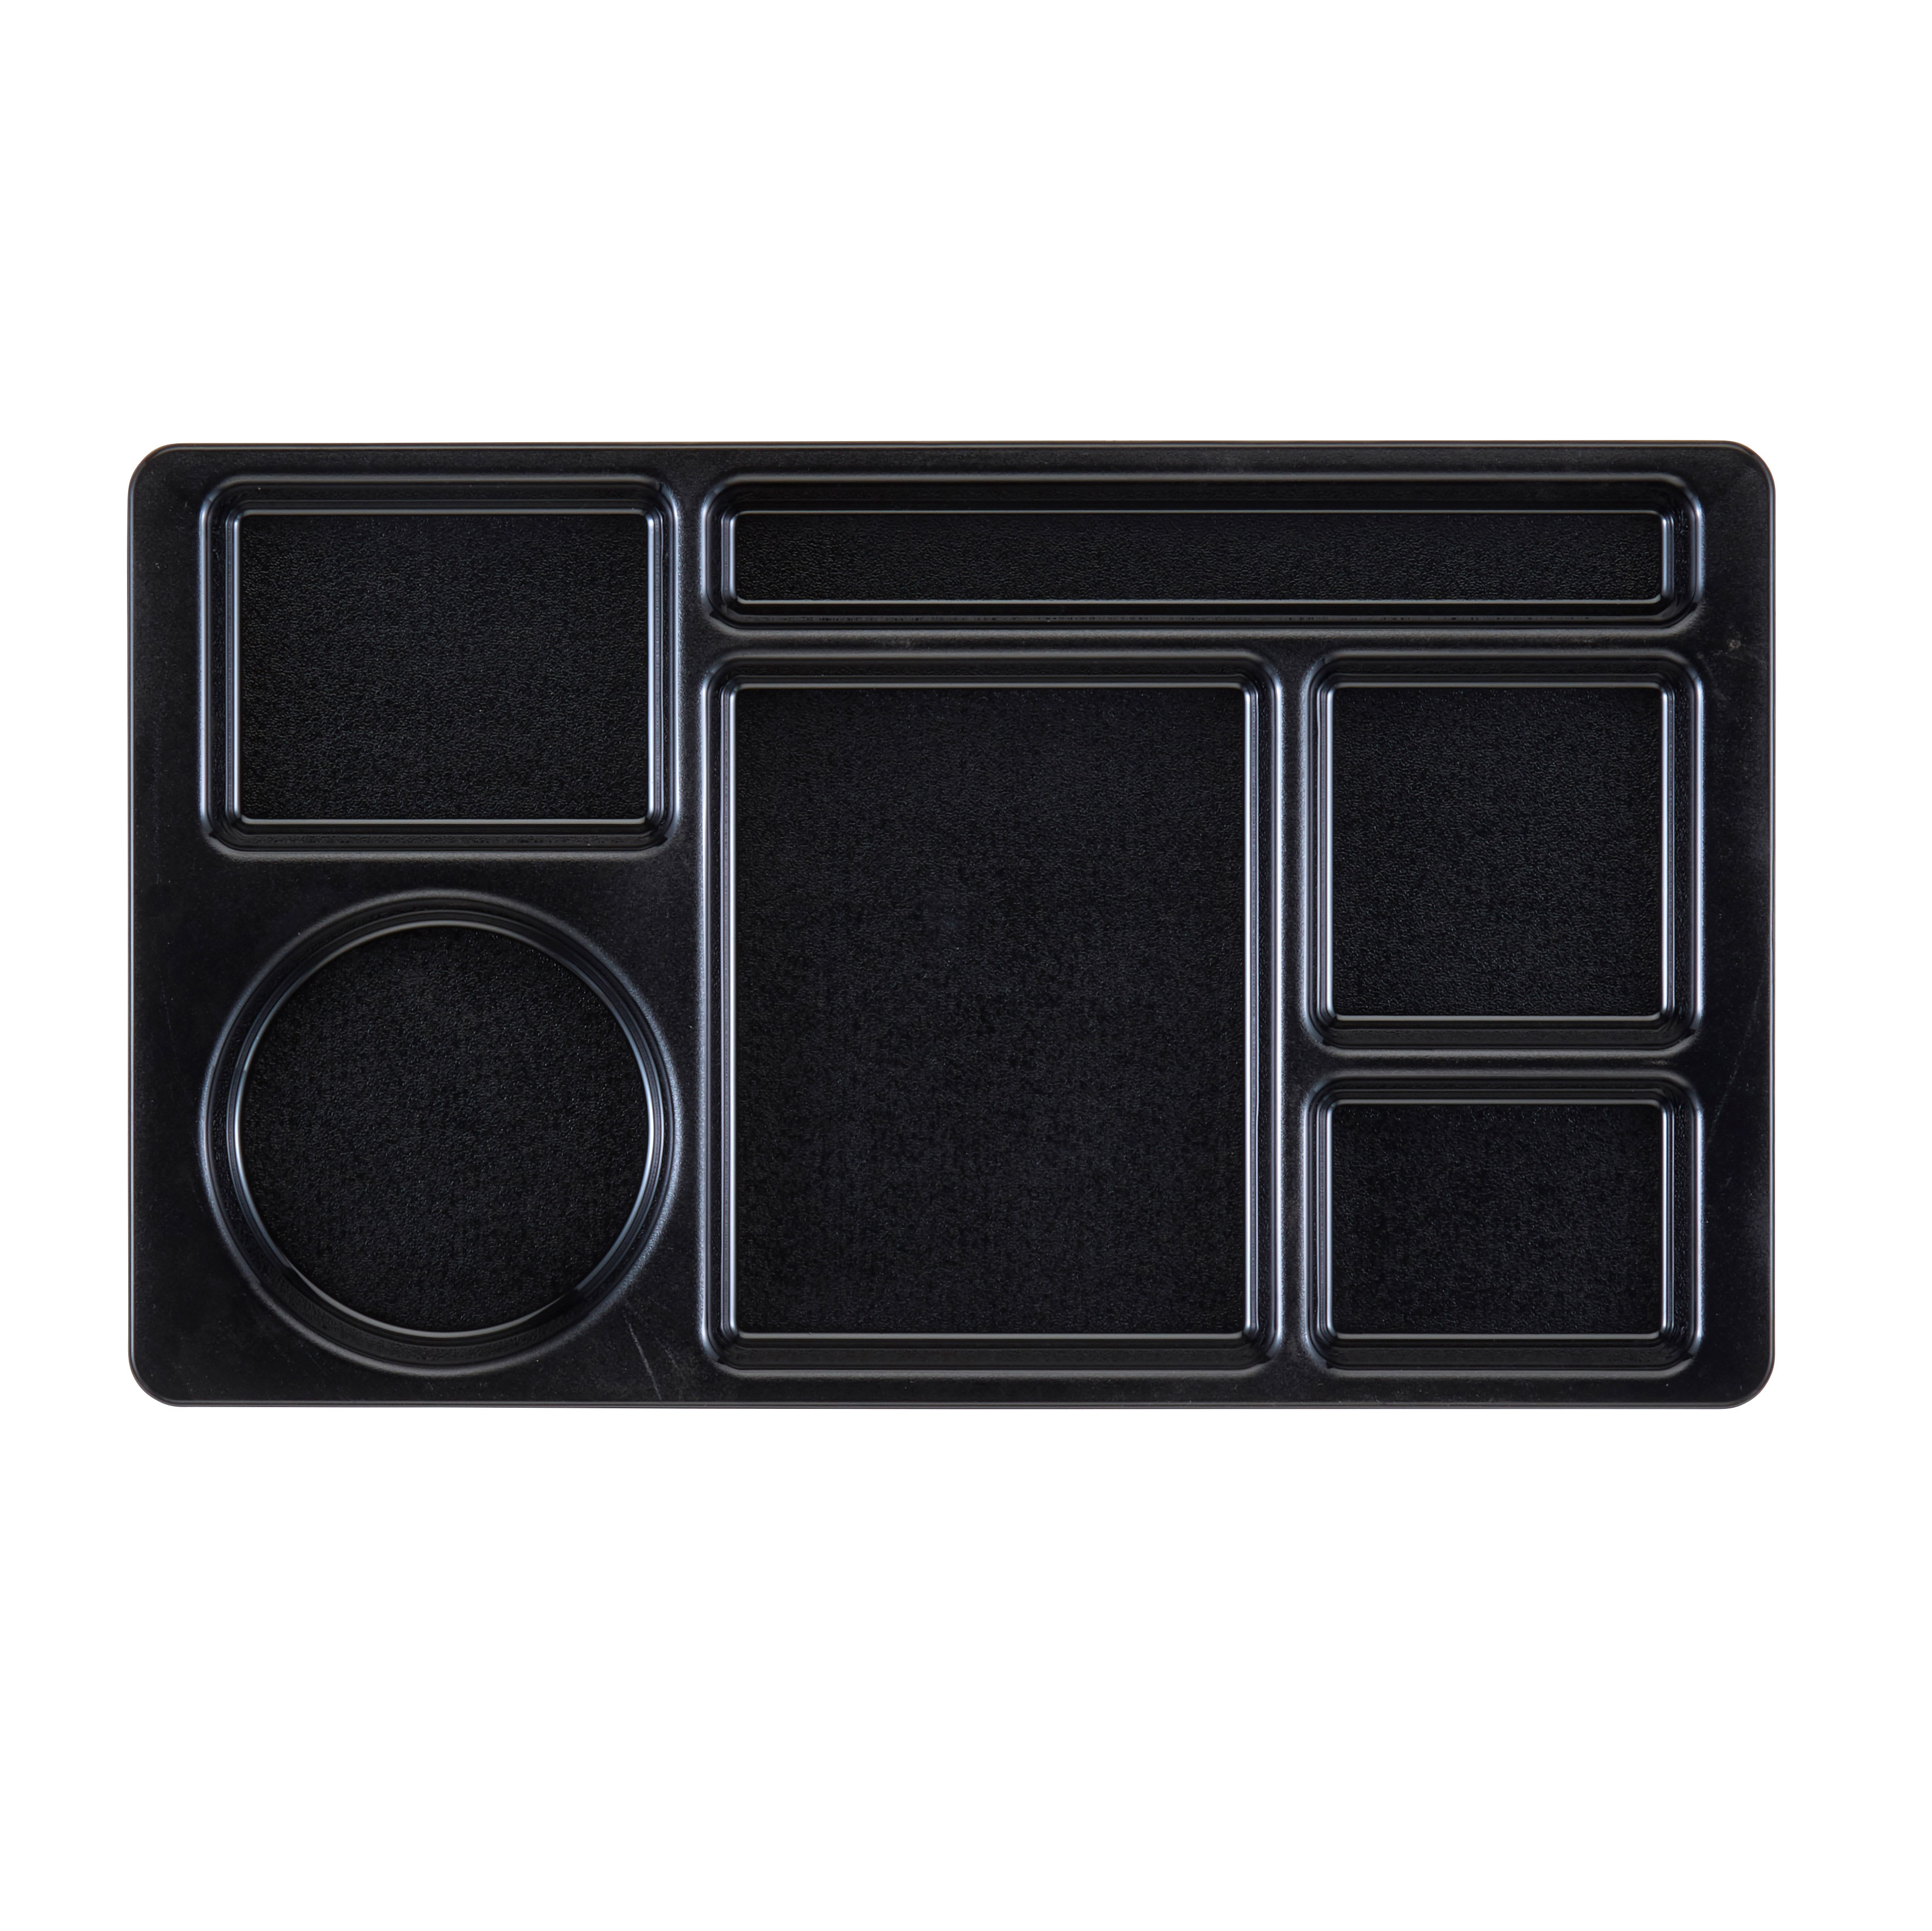 "Cambro 915CW-110 Rectangular Camwear Tray - 9x15"" 6-Compartments, Black"